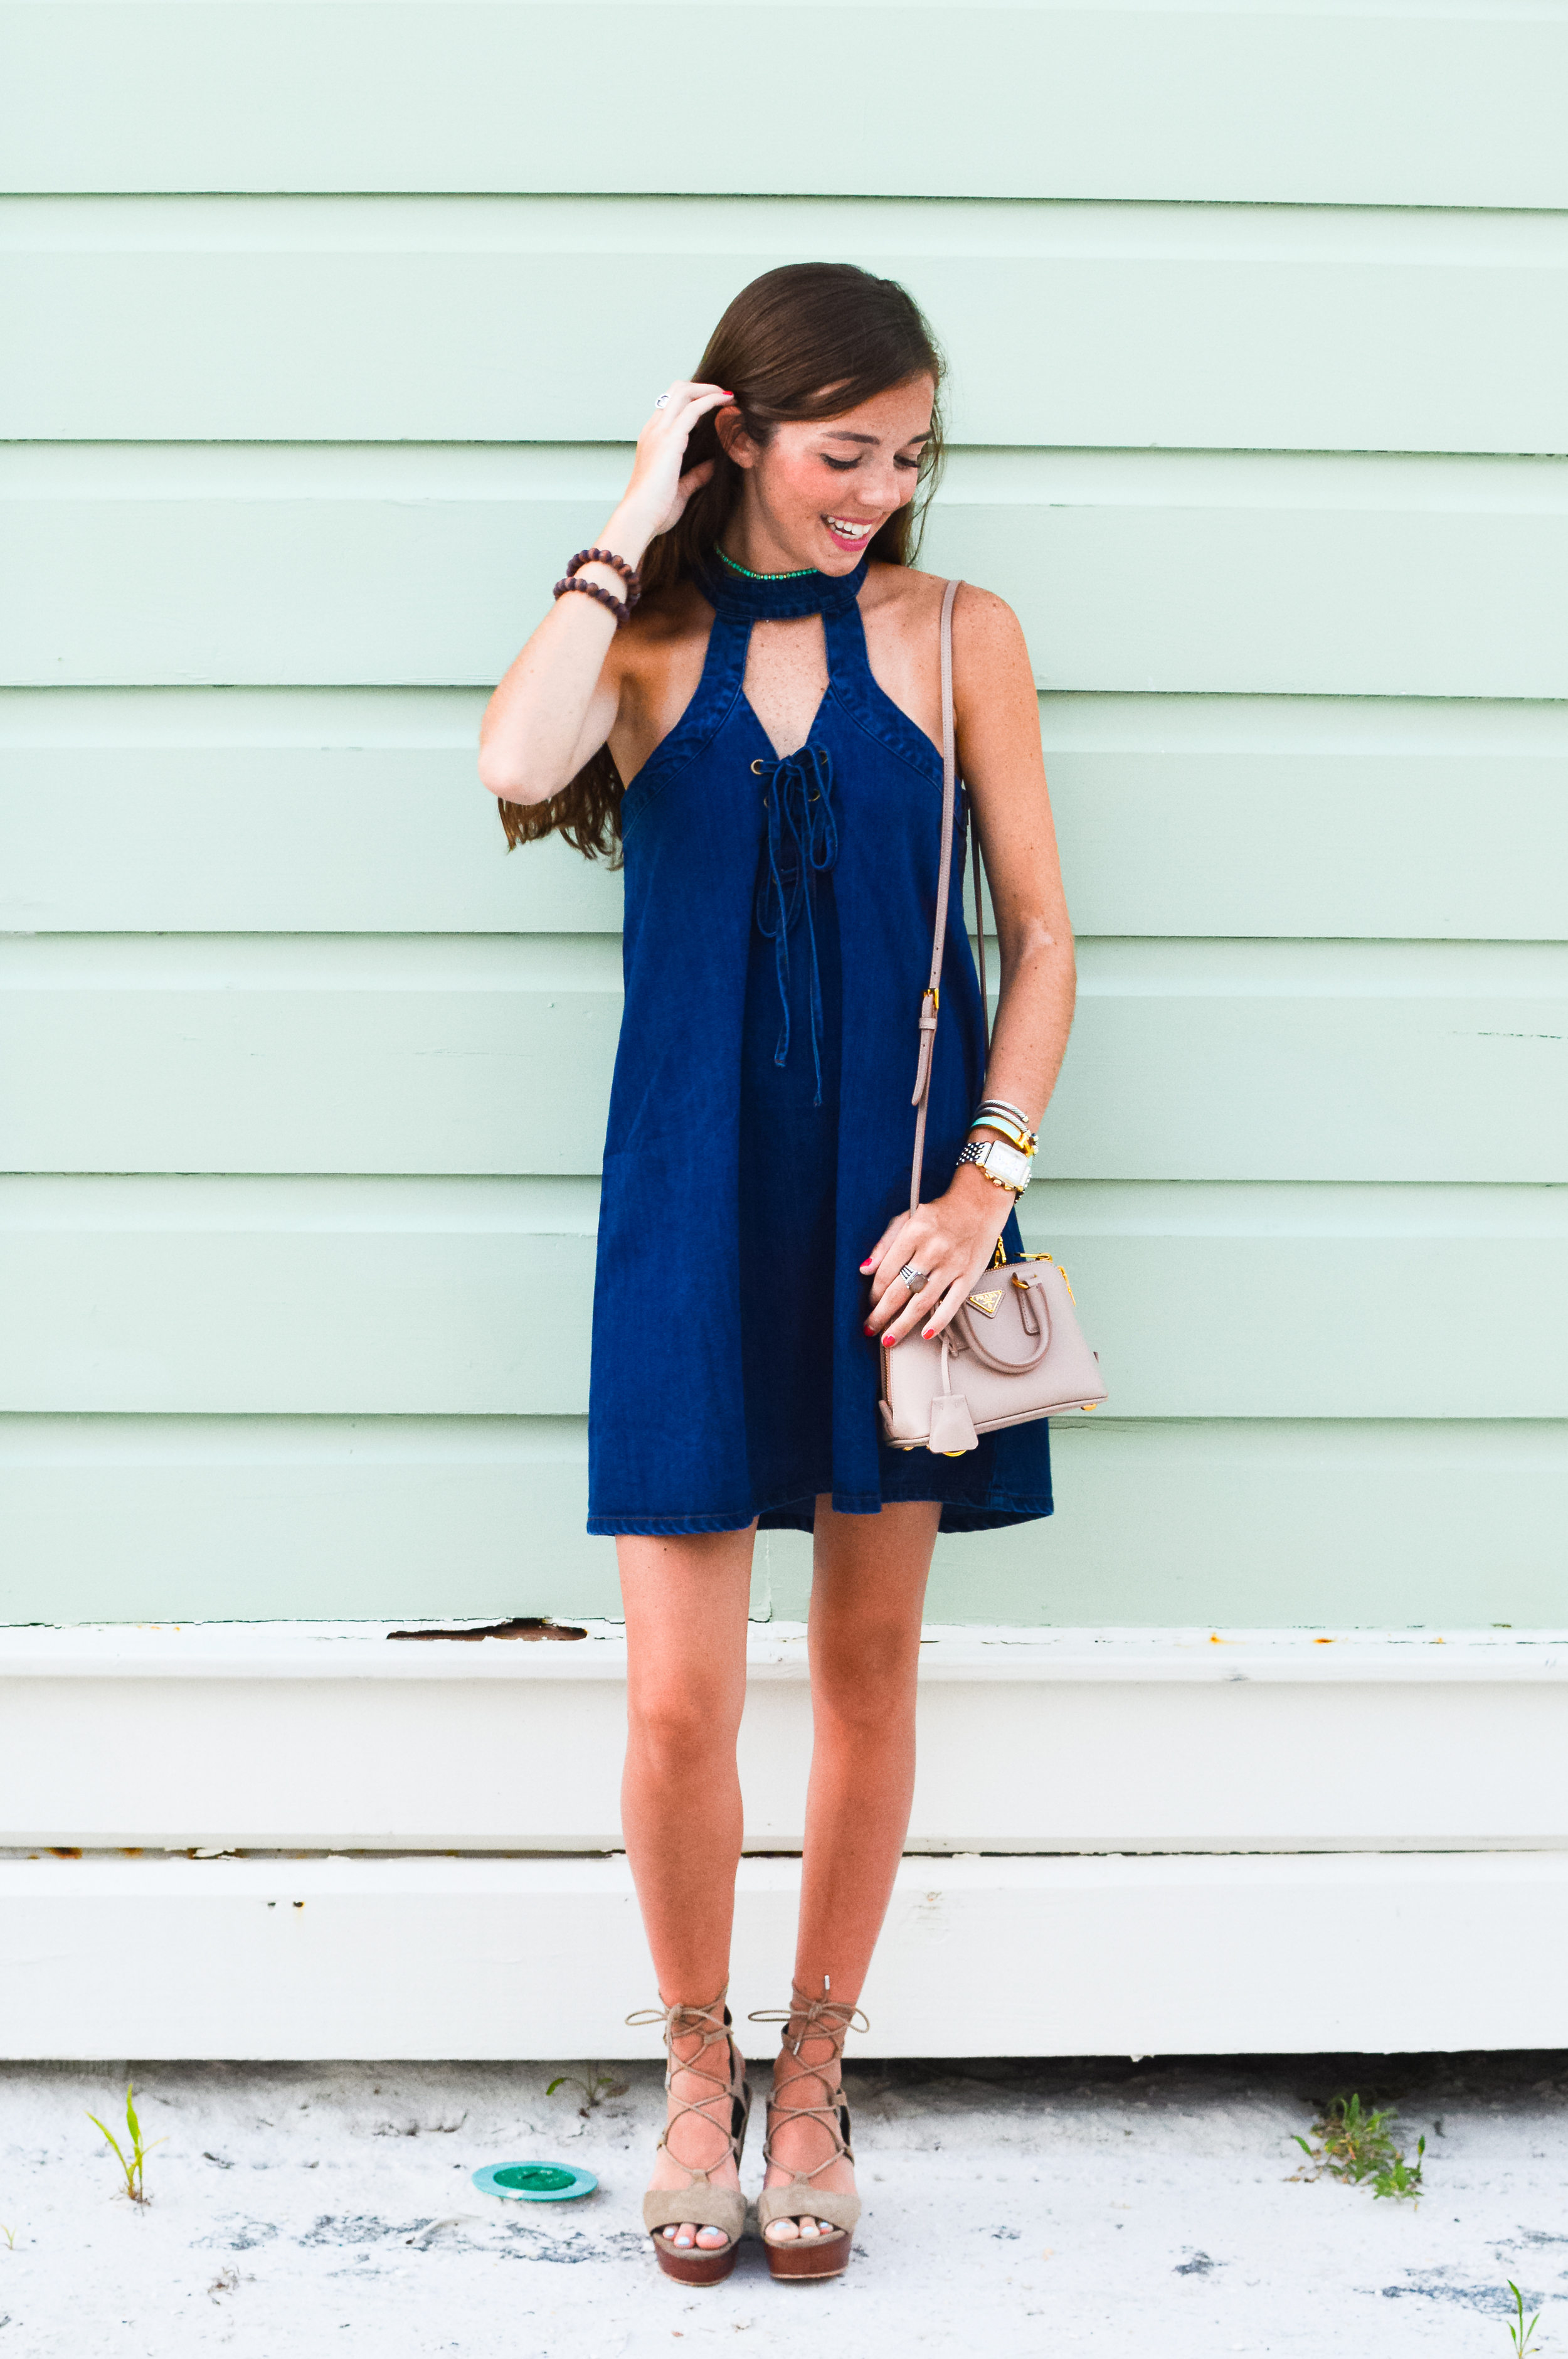 fashion blogger lcb style blue dress (11 of 14).jpg